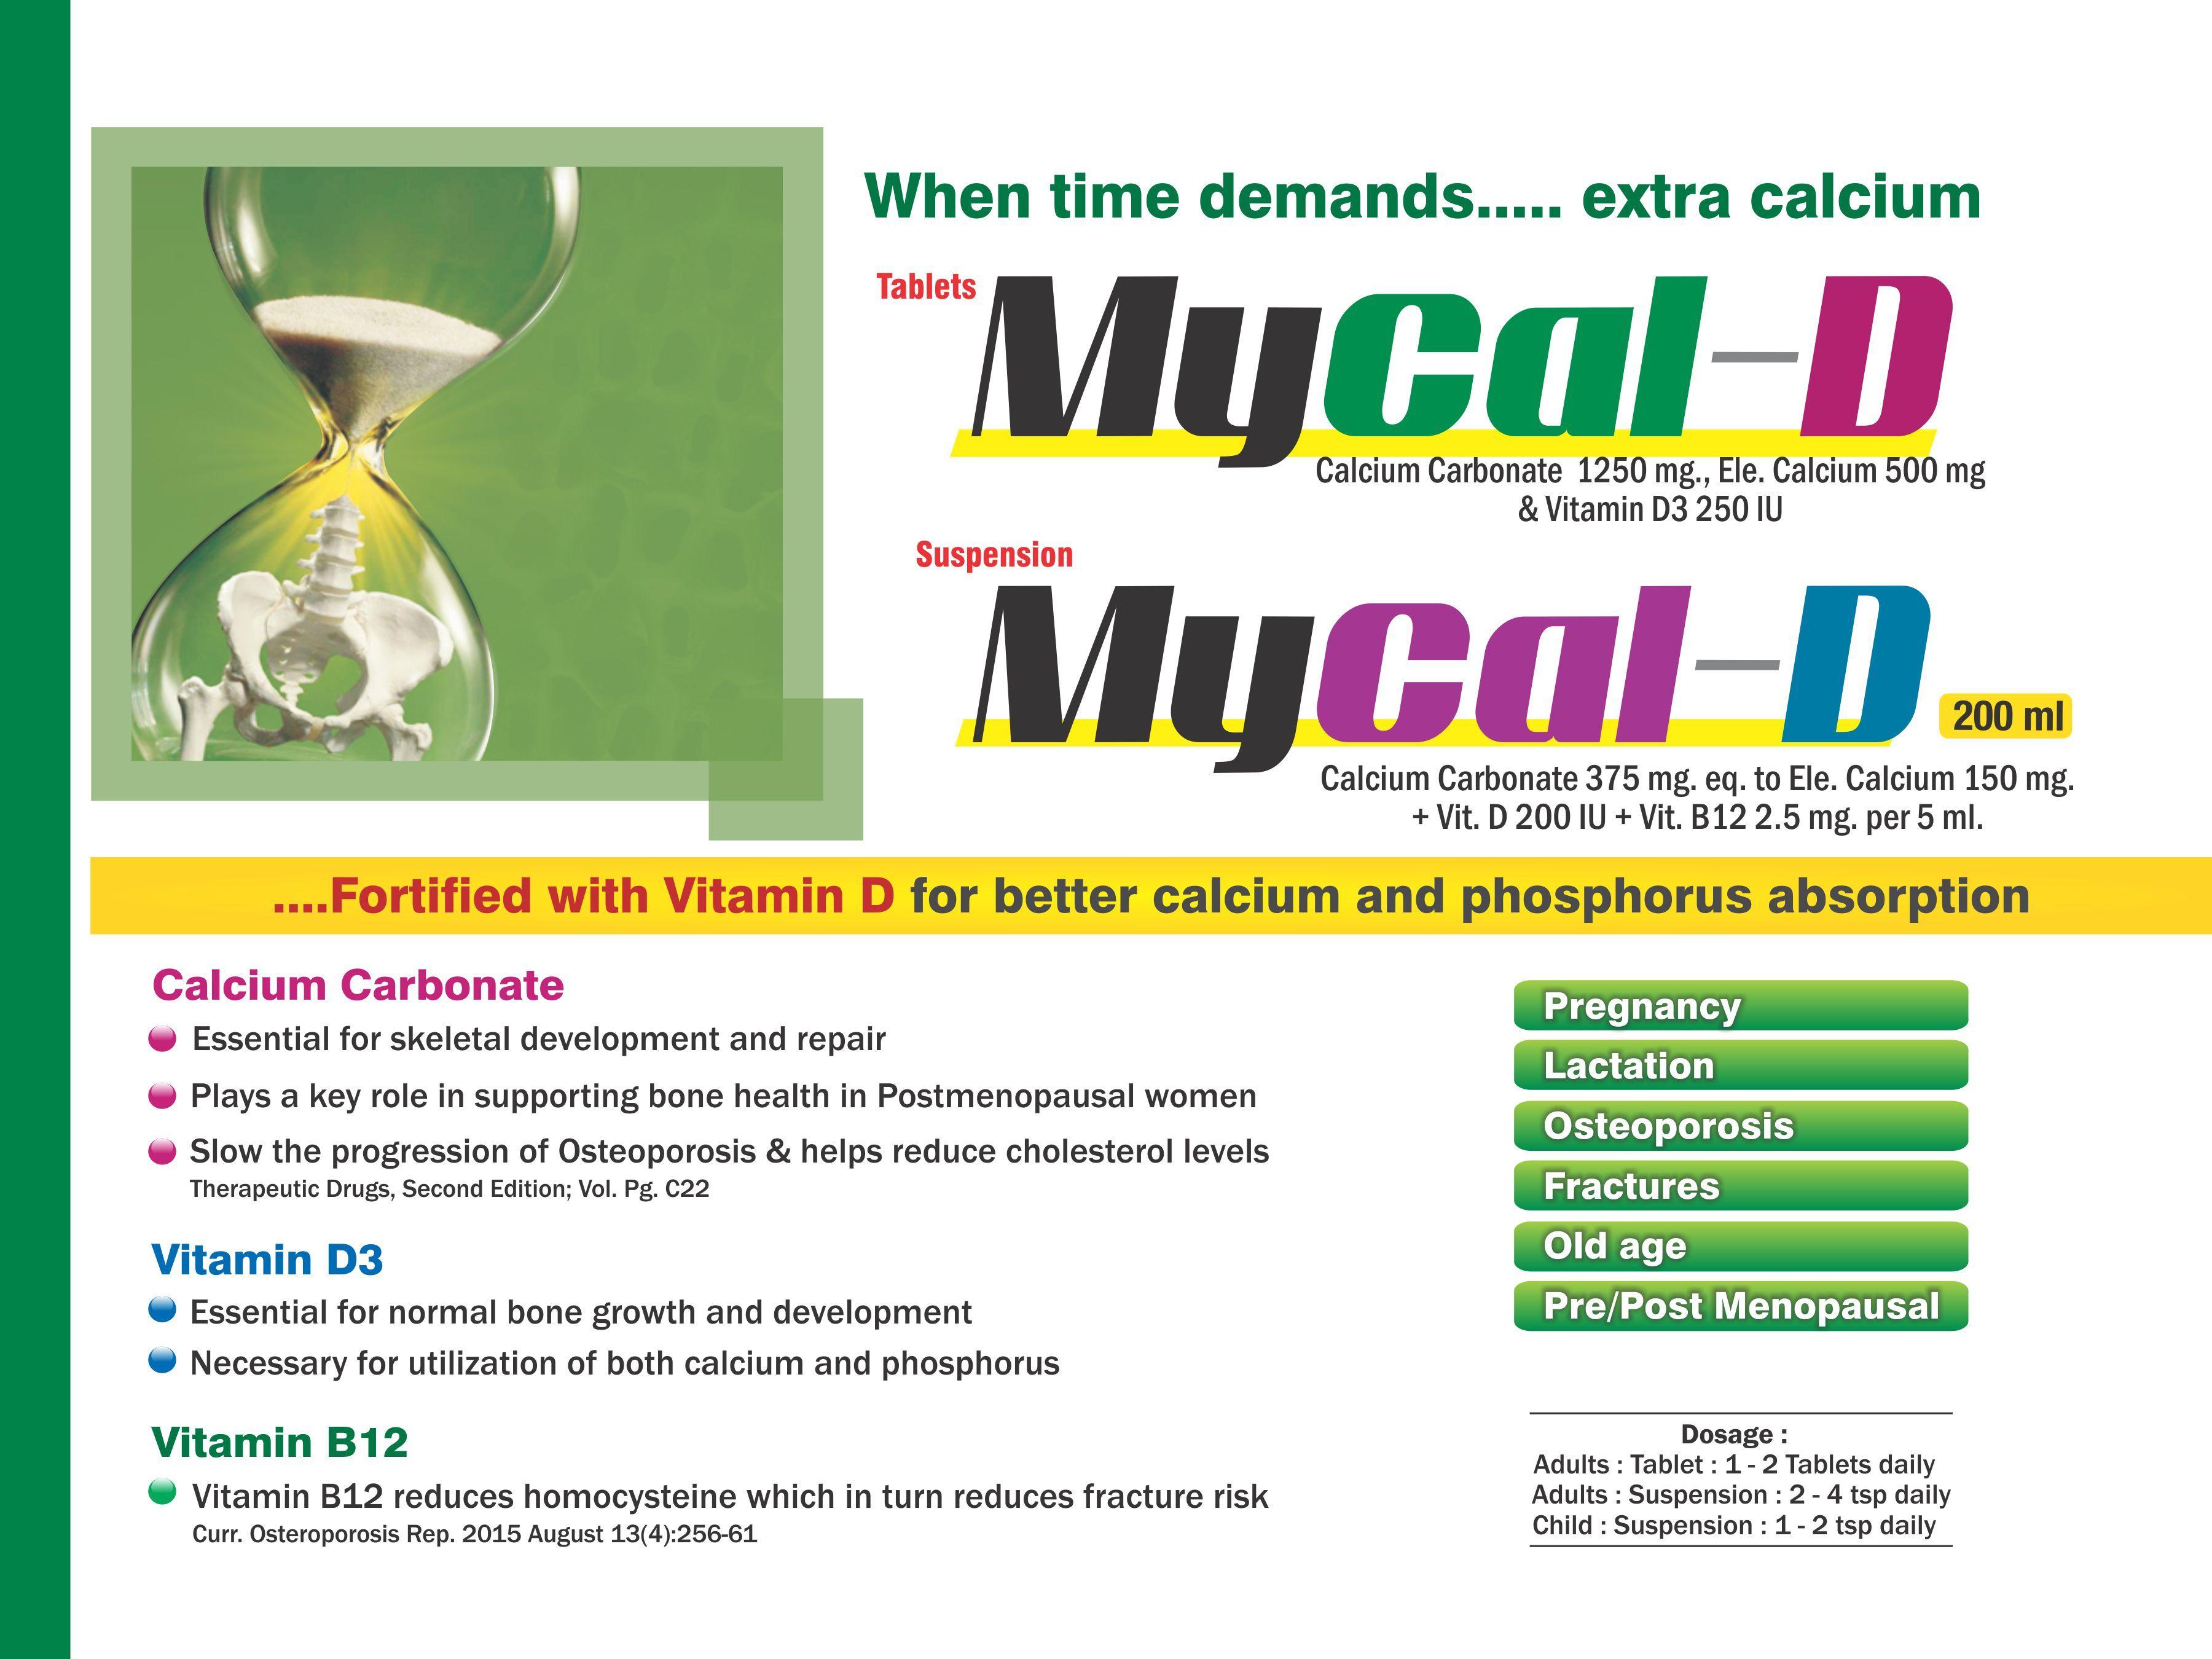 Calcium Carbonate 1250 Mg Eq. to Elemental Calcium 500 Mg & Vitamin D3 200 I.U. Tablet